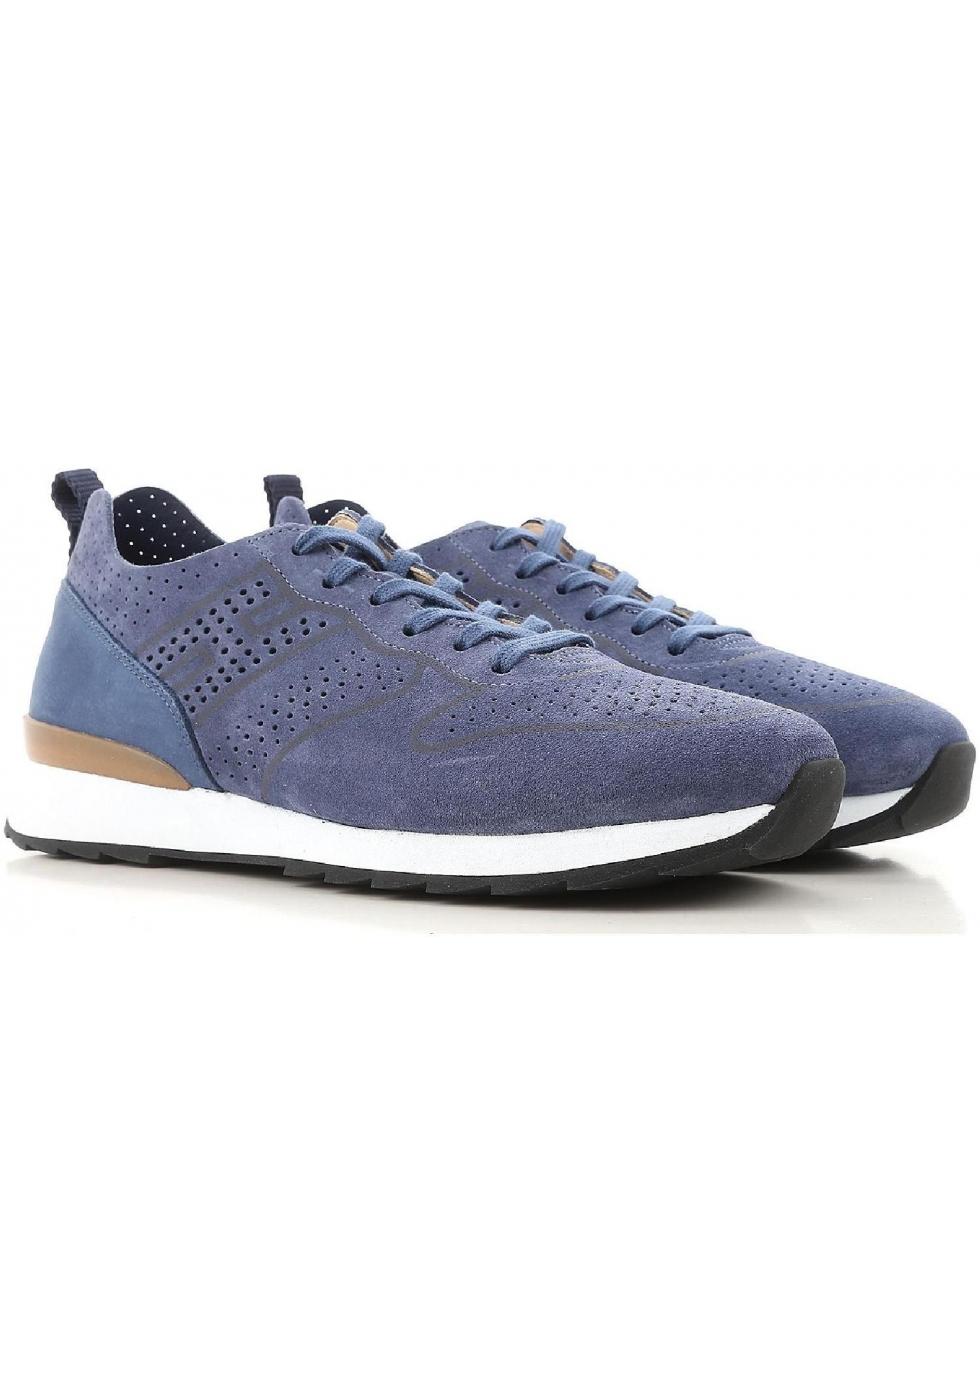 Sneakers Hogan uomo in pelle scamosciata blu - Italian Boutique